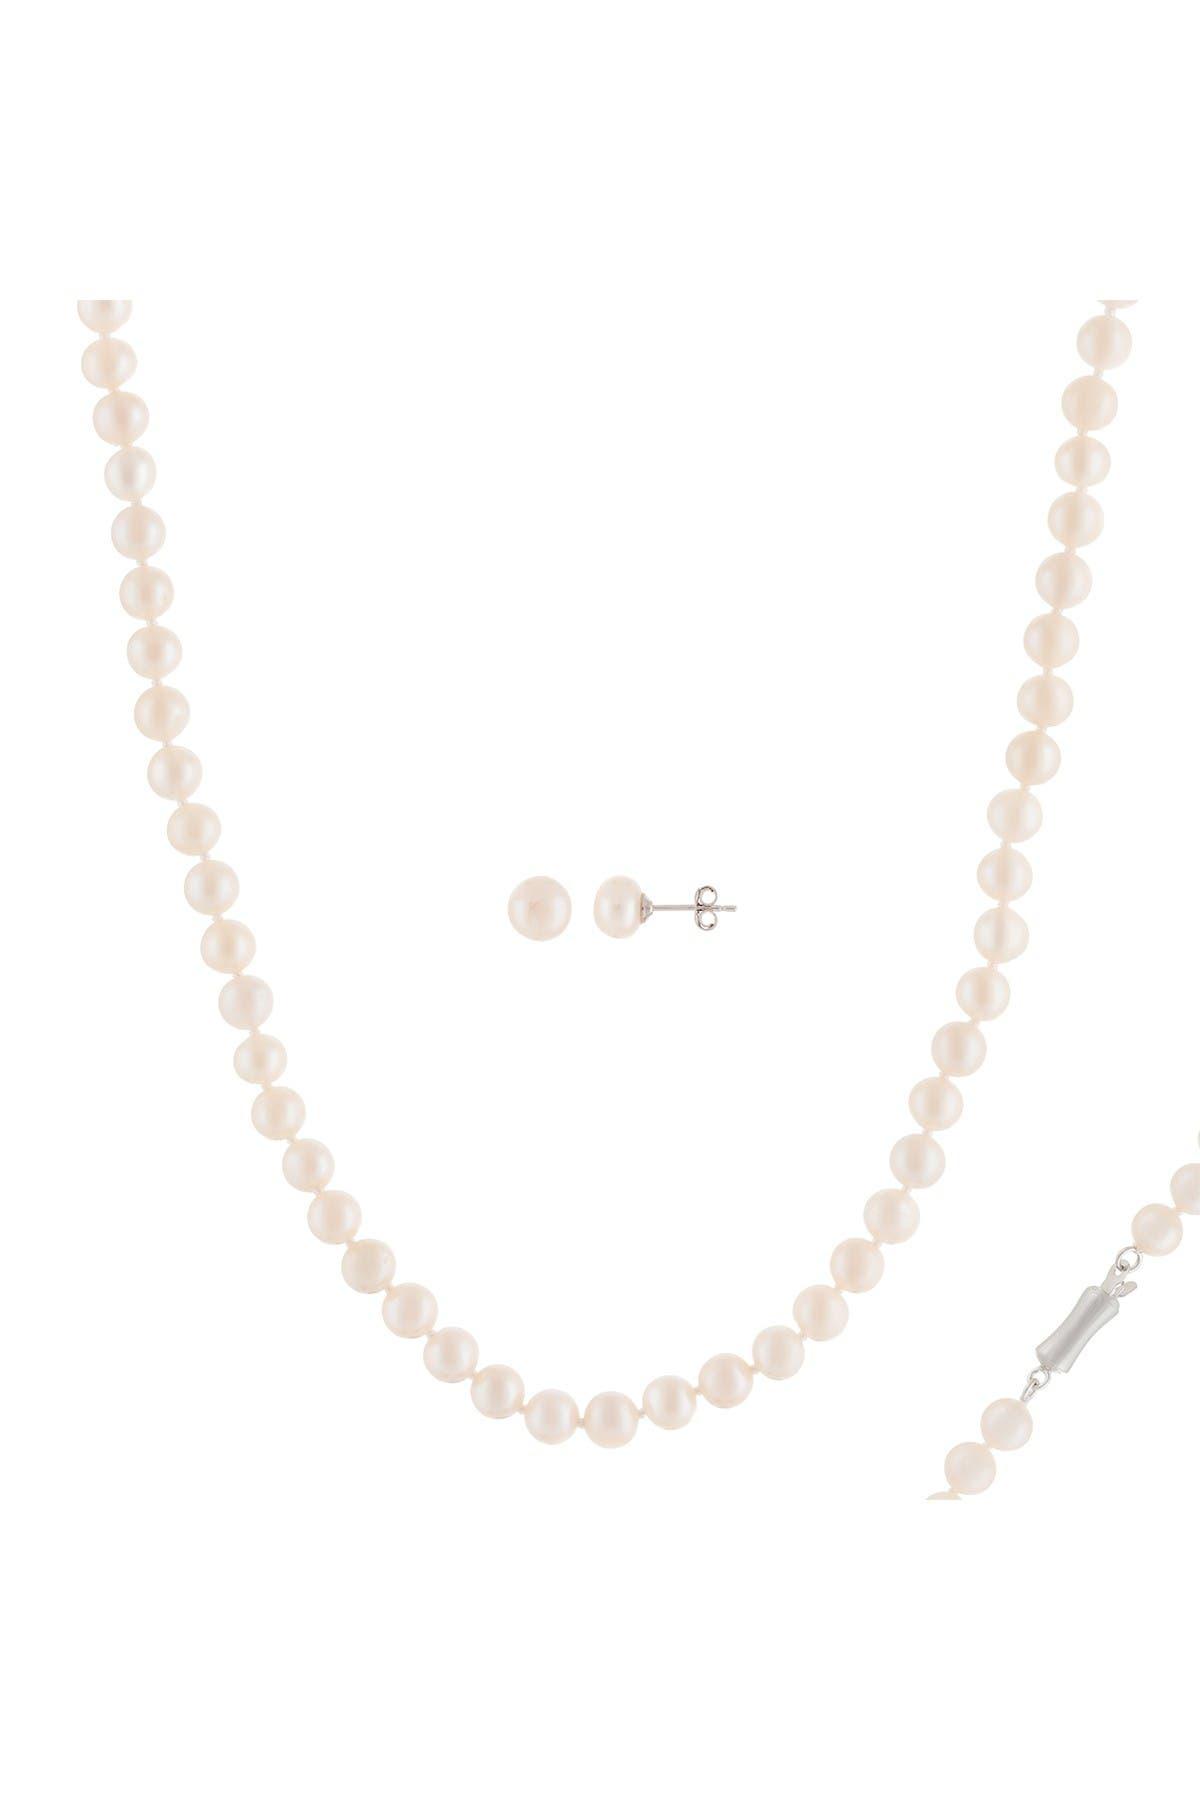 Splendid Pearls 7-8mm White Freshwater Pearl Earrings & Necklace Set at Nordstrom Rack